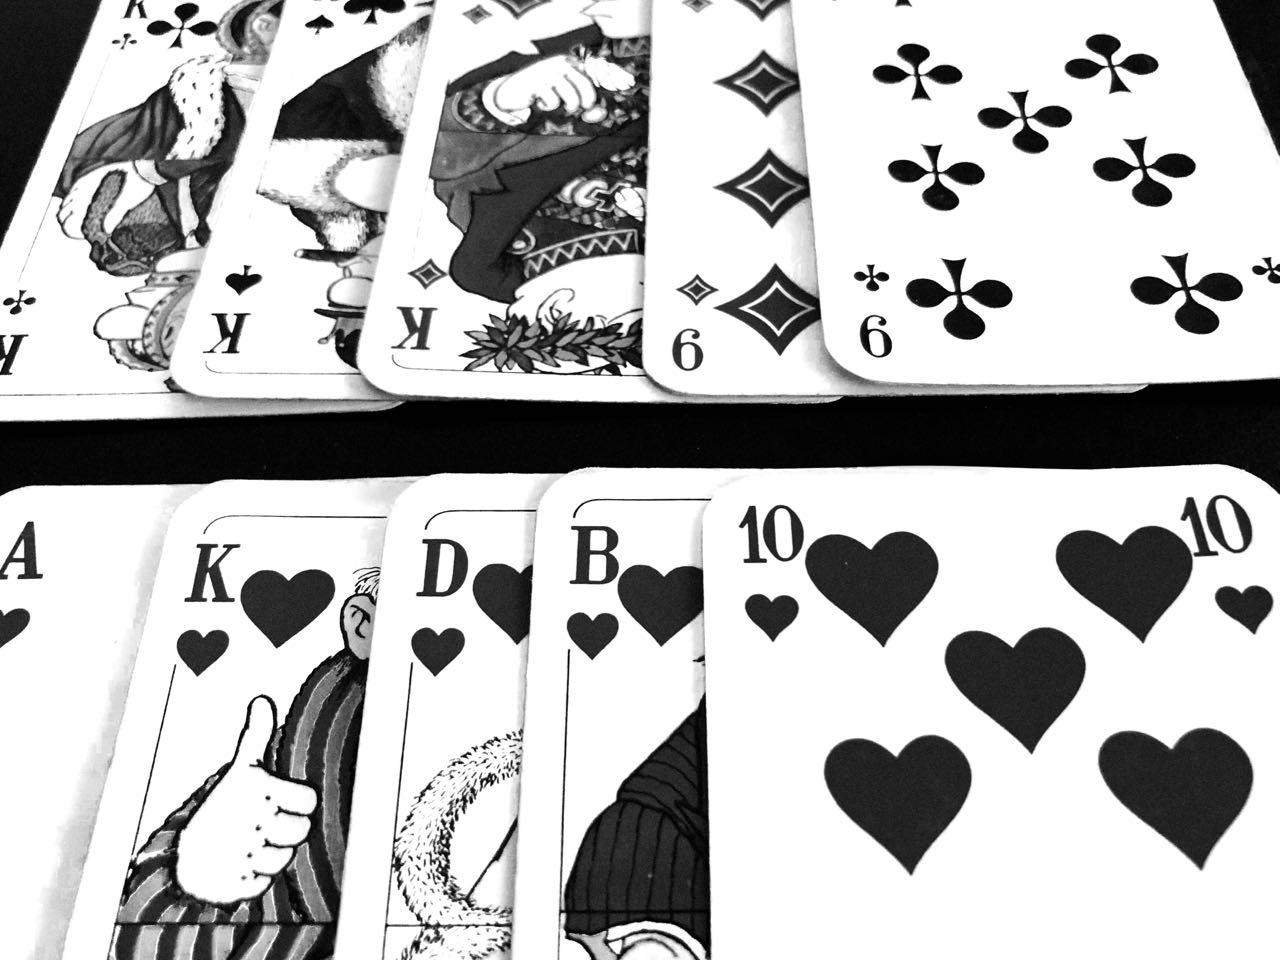 Digitales Pokerin Online-Casinos (Foto:xity)